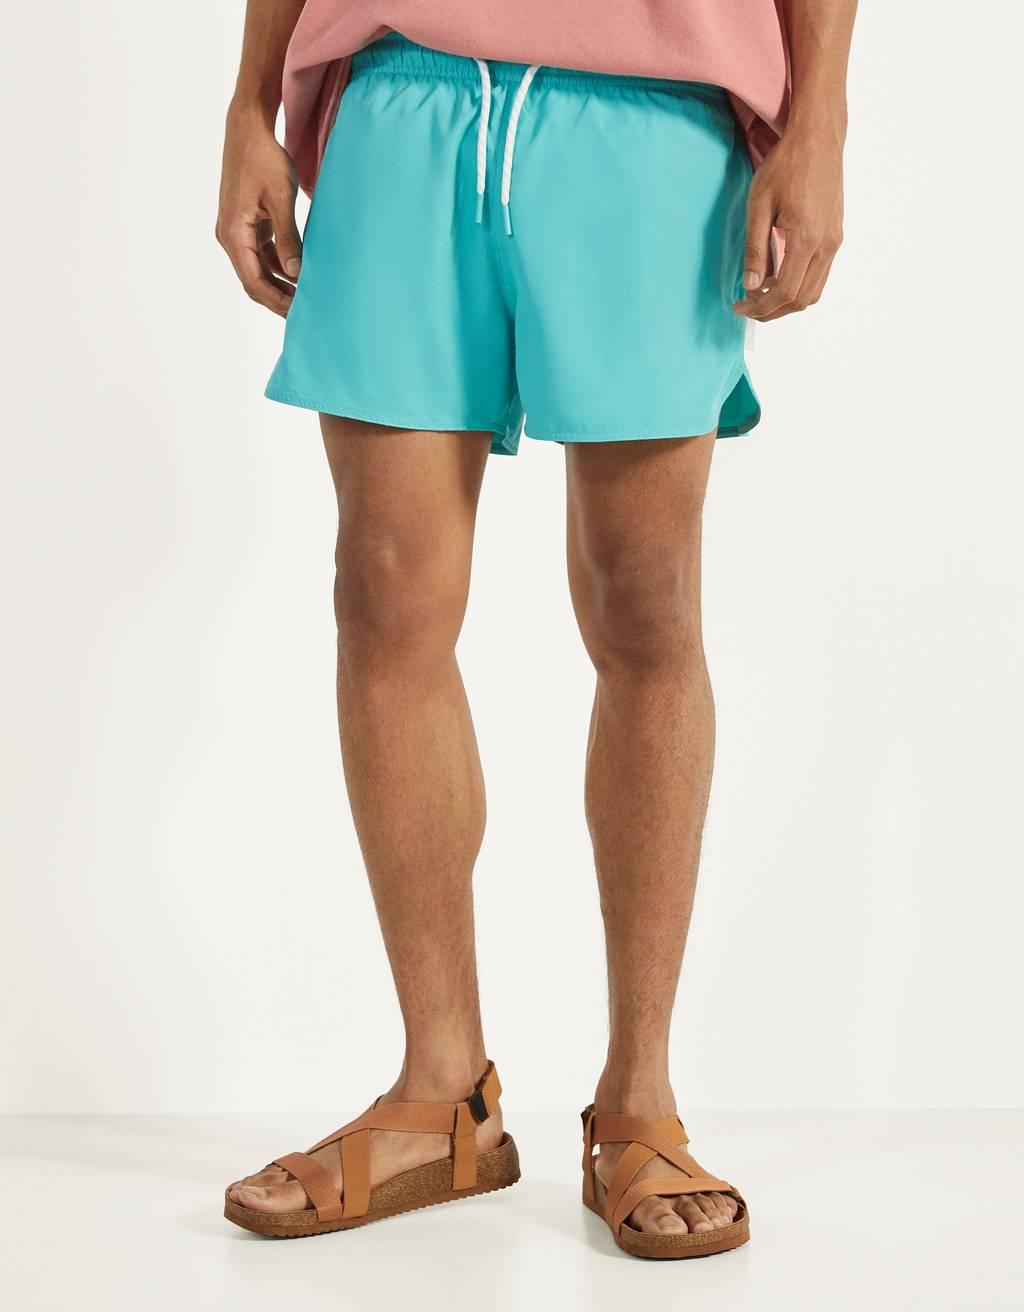 Едноцветни бански тип шорти